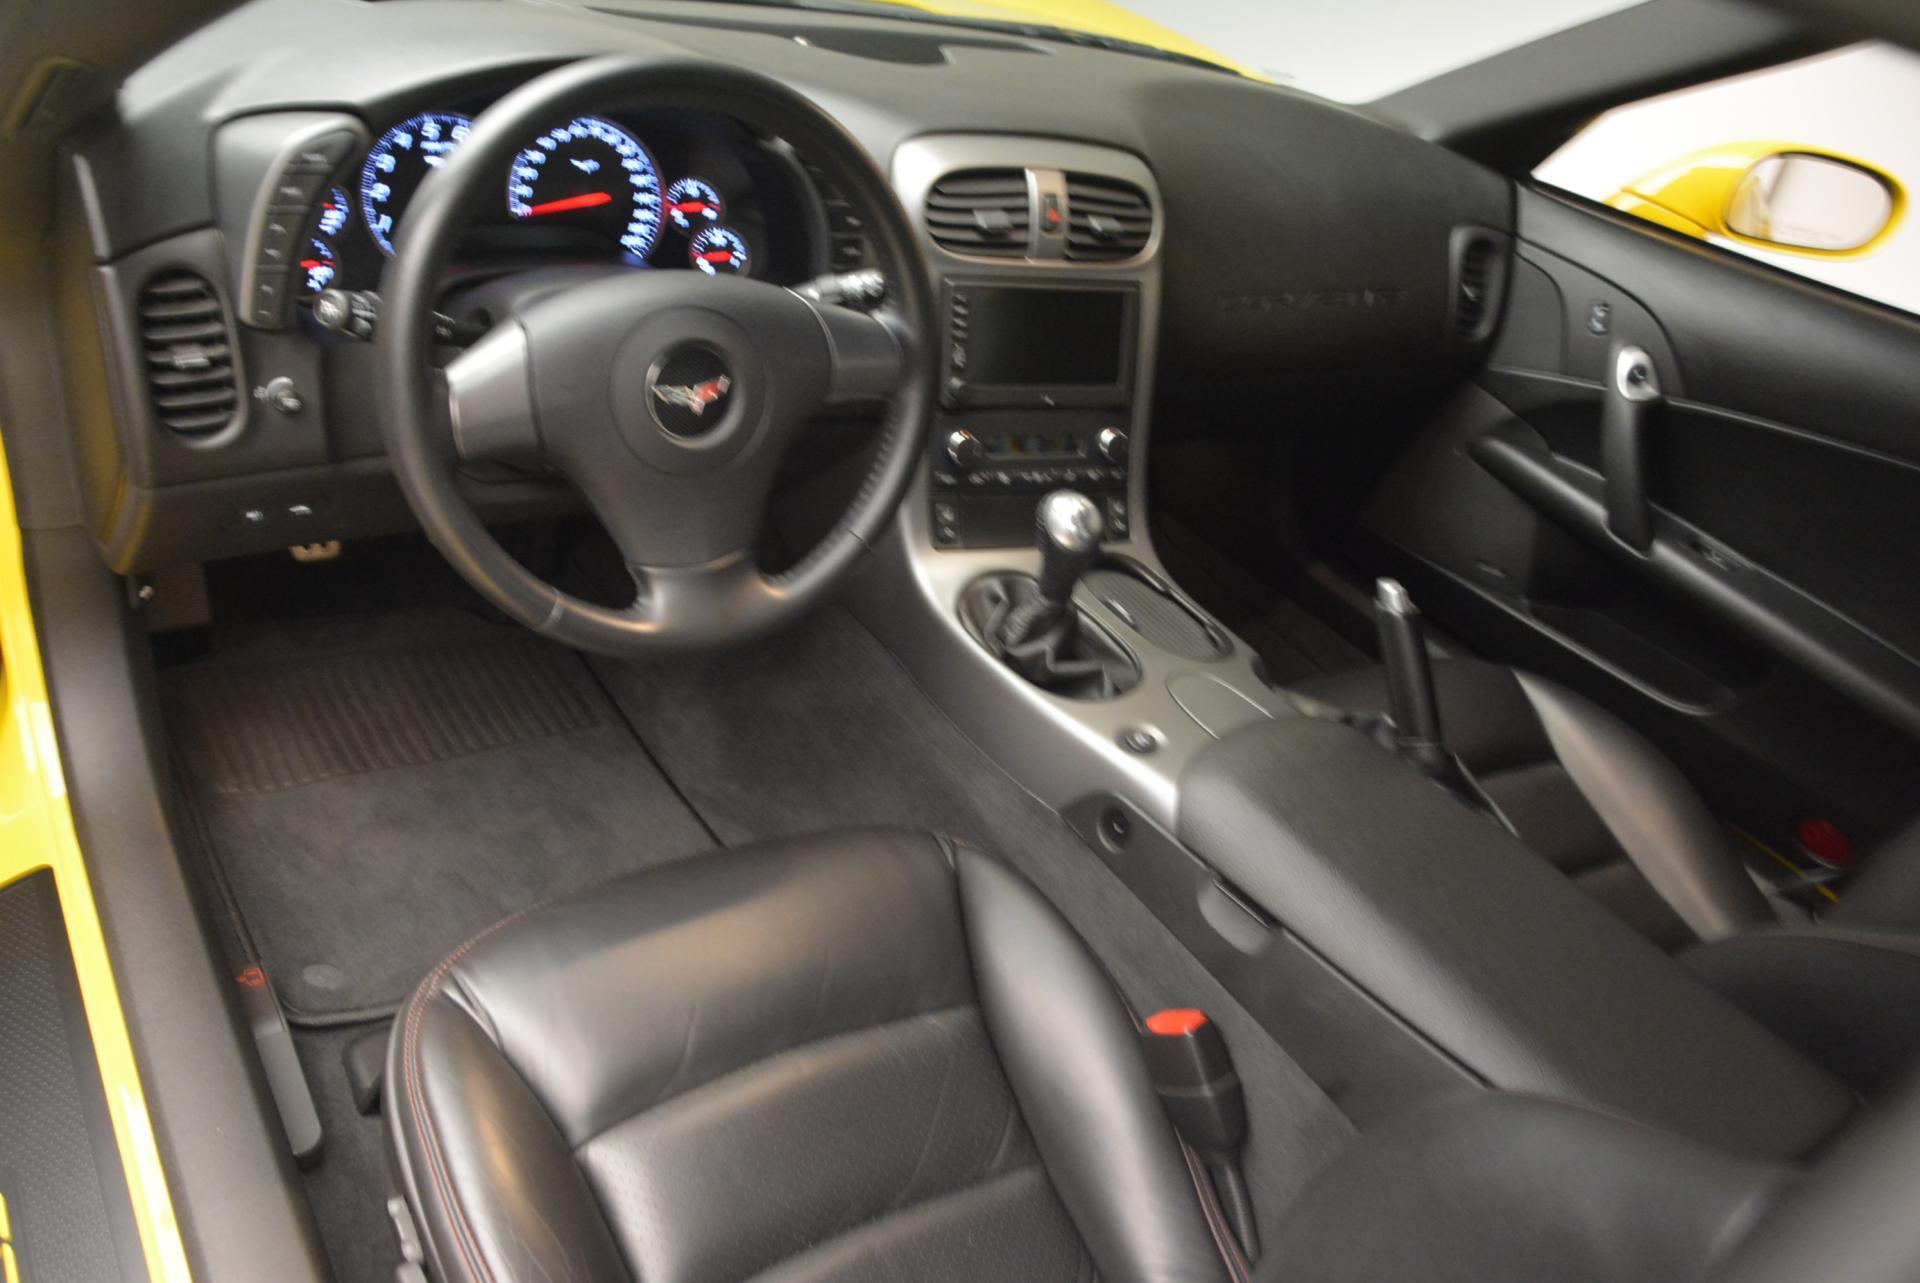 Used 2006 Chevrolet Corvette Z06 Hardtop For Sale In Greenwich, CT. Alfa Romeo of Greenwich, 7085 530_p12